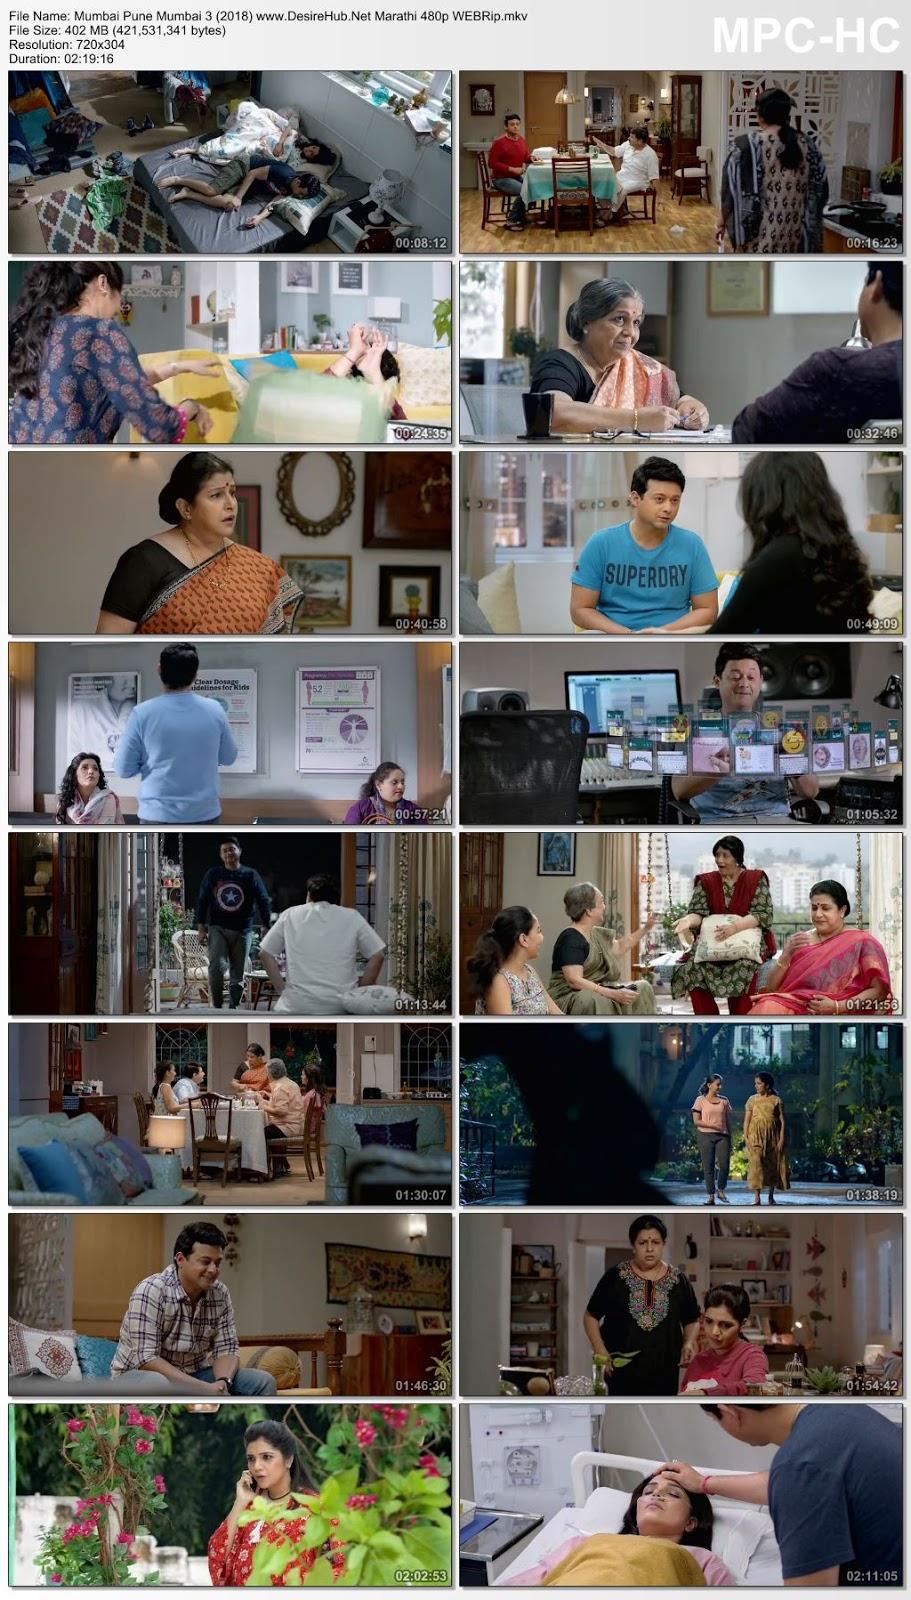 Mumbai Pune Mumbai 3 (2018) Marathi 480p WEBRip 400MB Desirehub